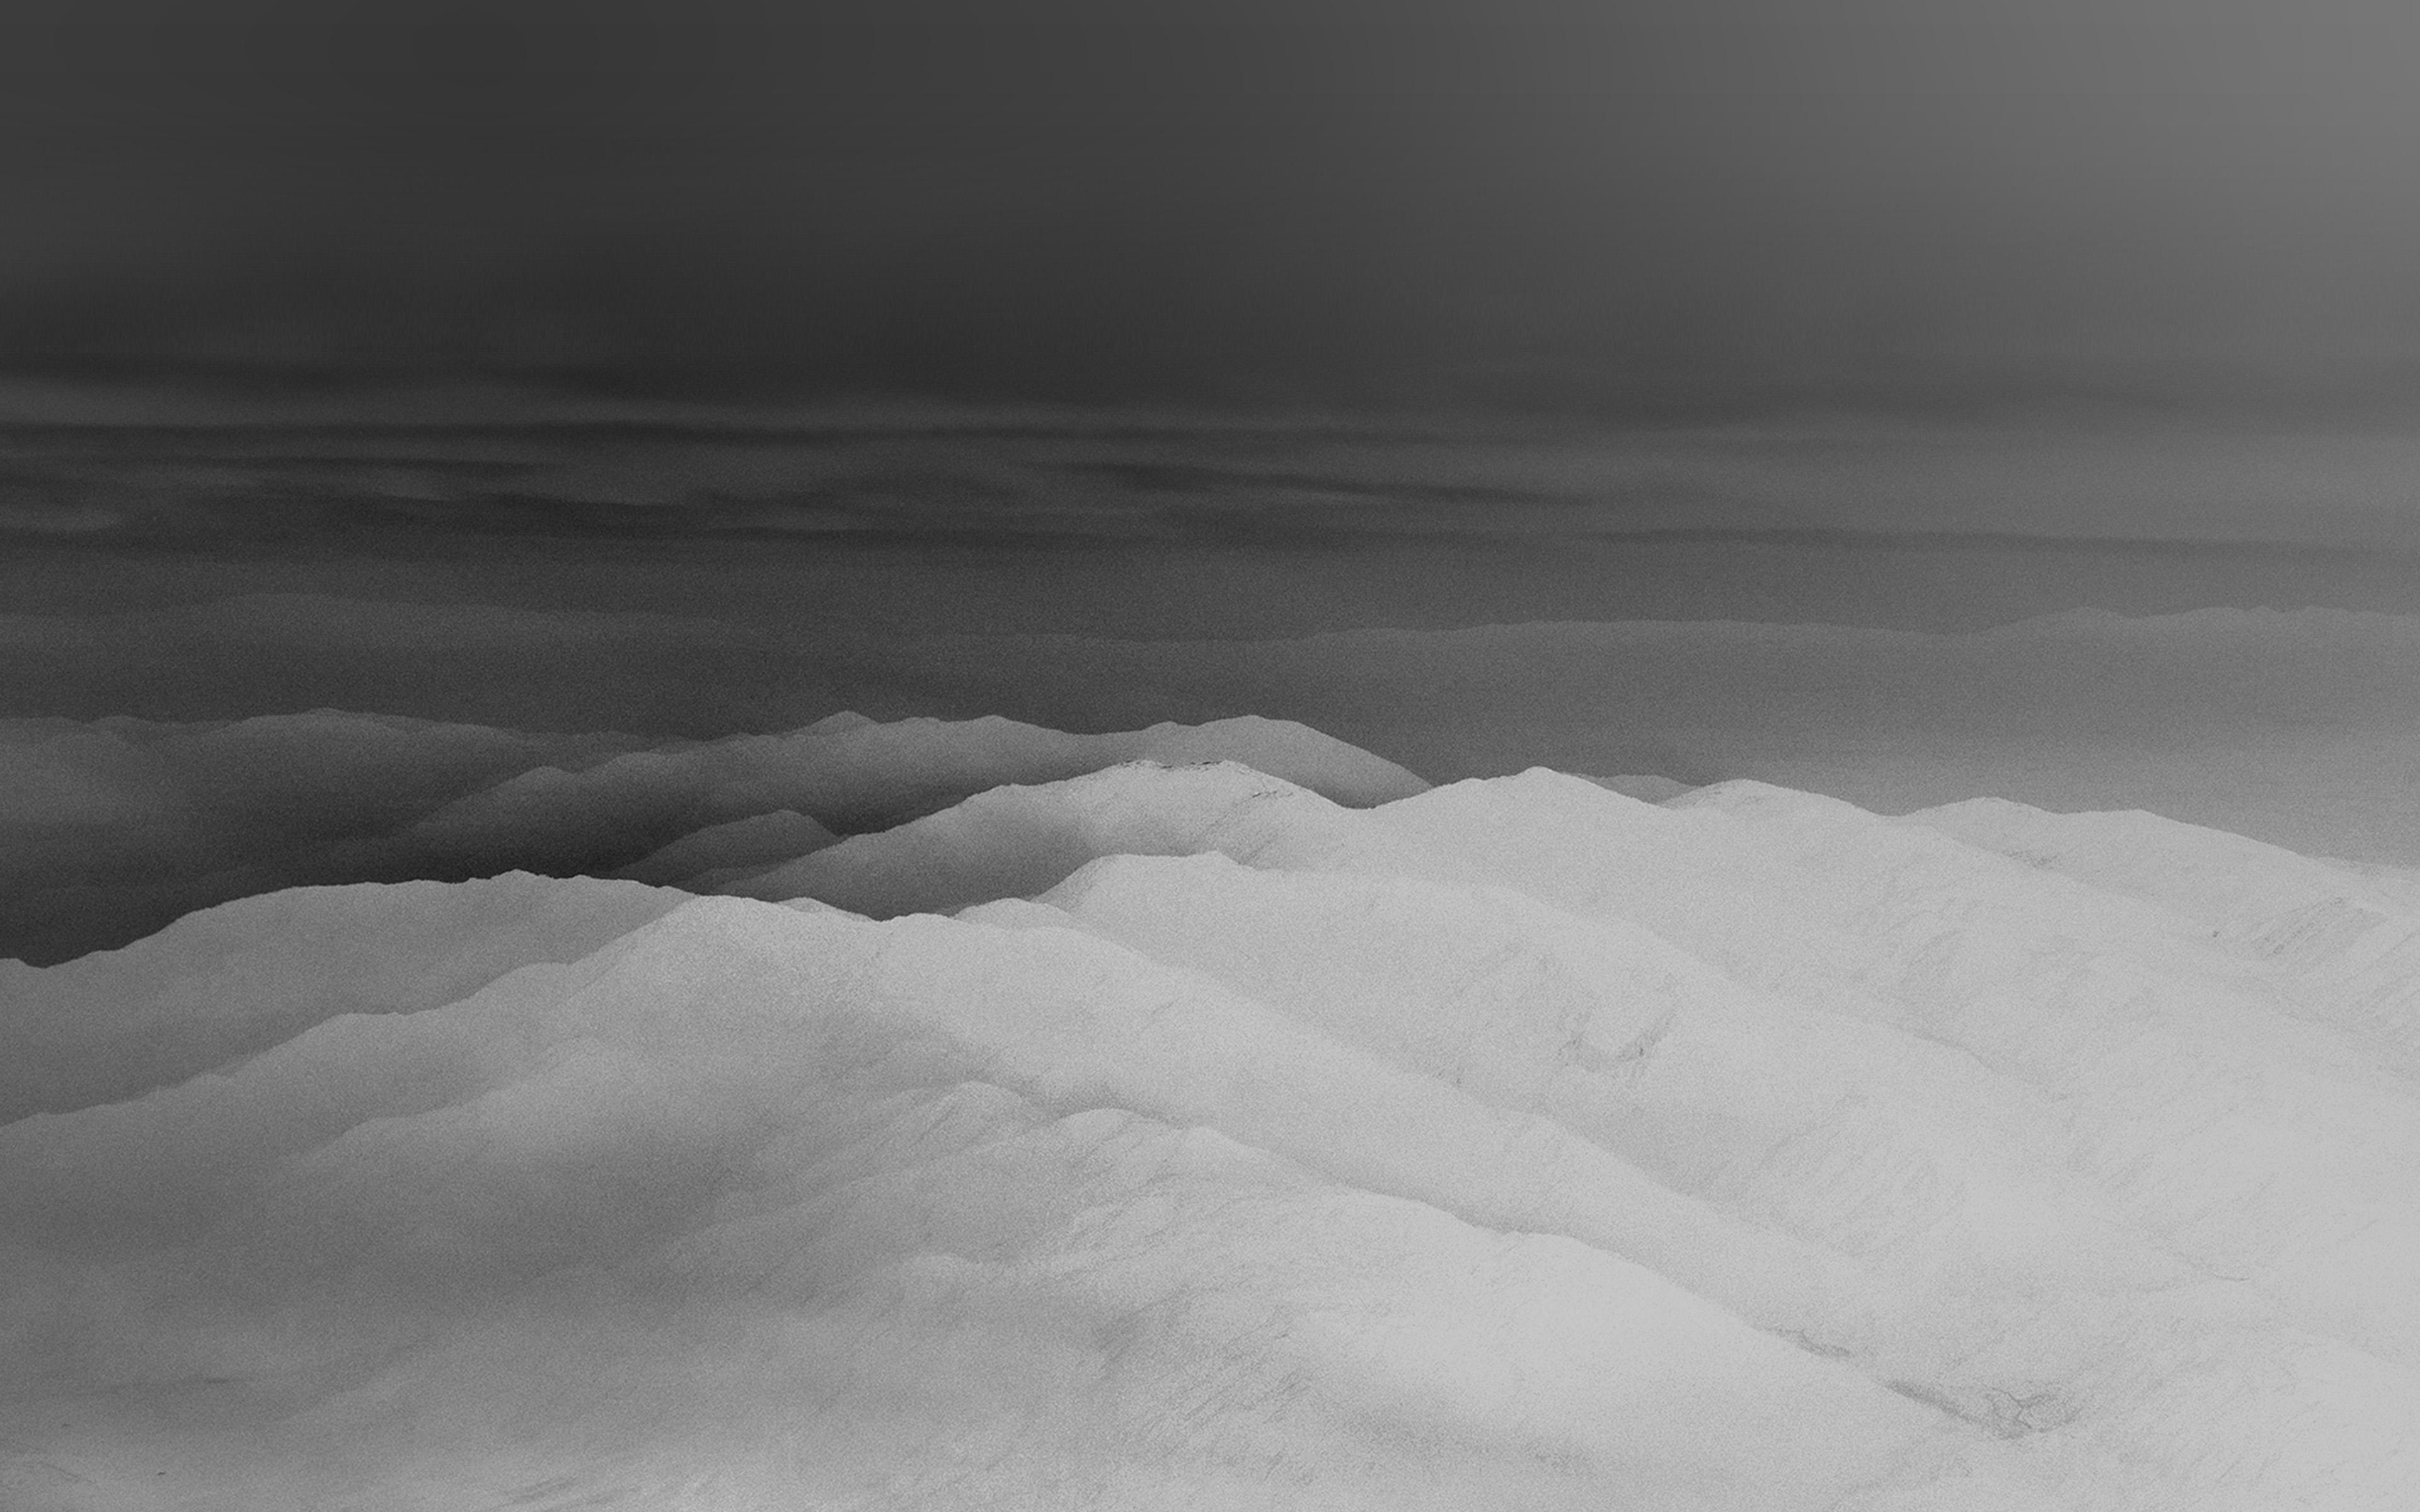 mu41-mountain-fog-nature-white-bw-gray-sky-view-wallpaper